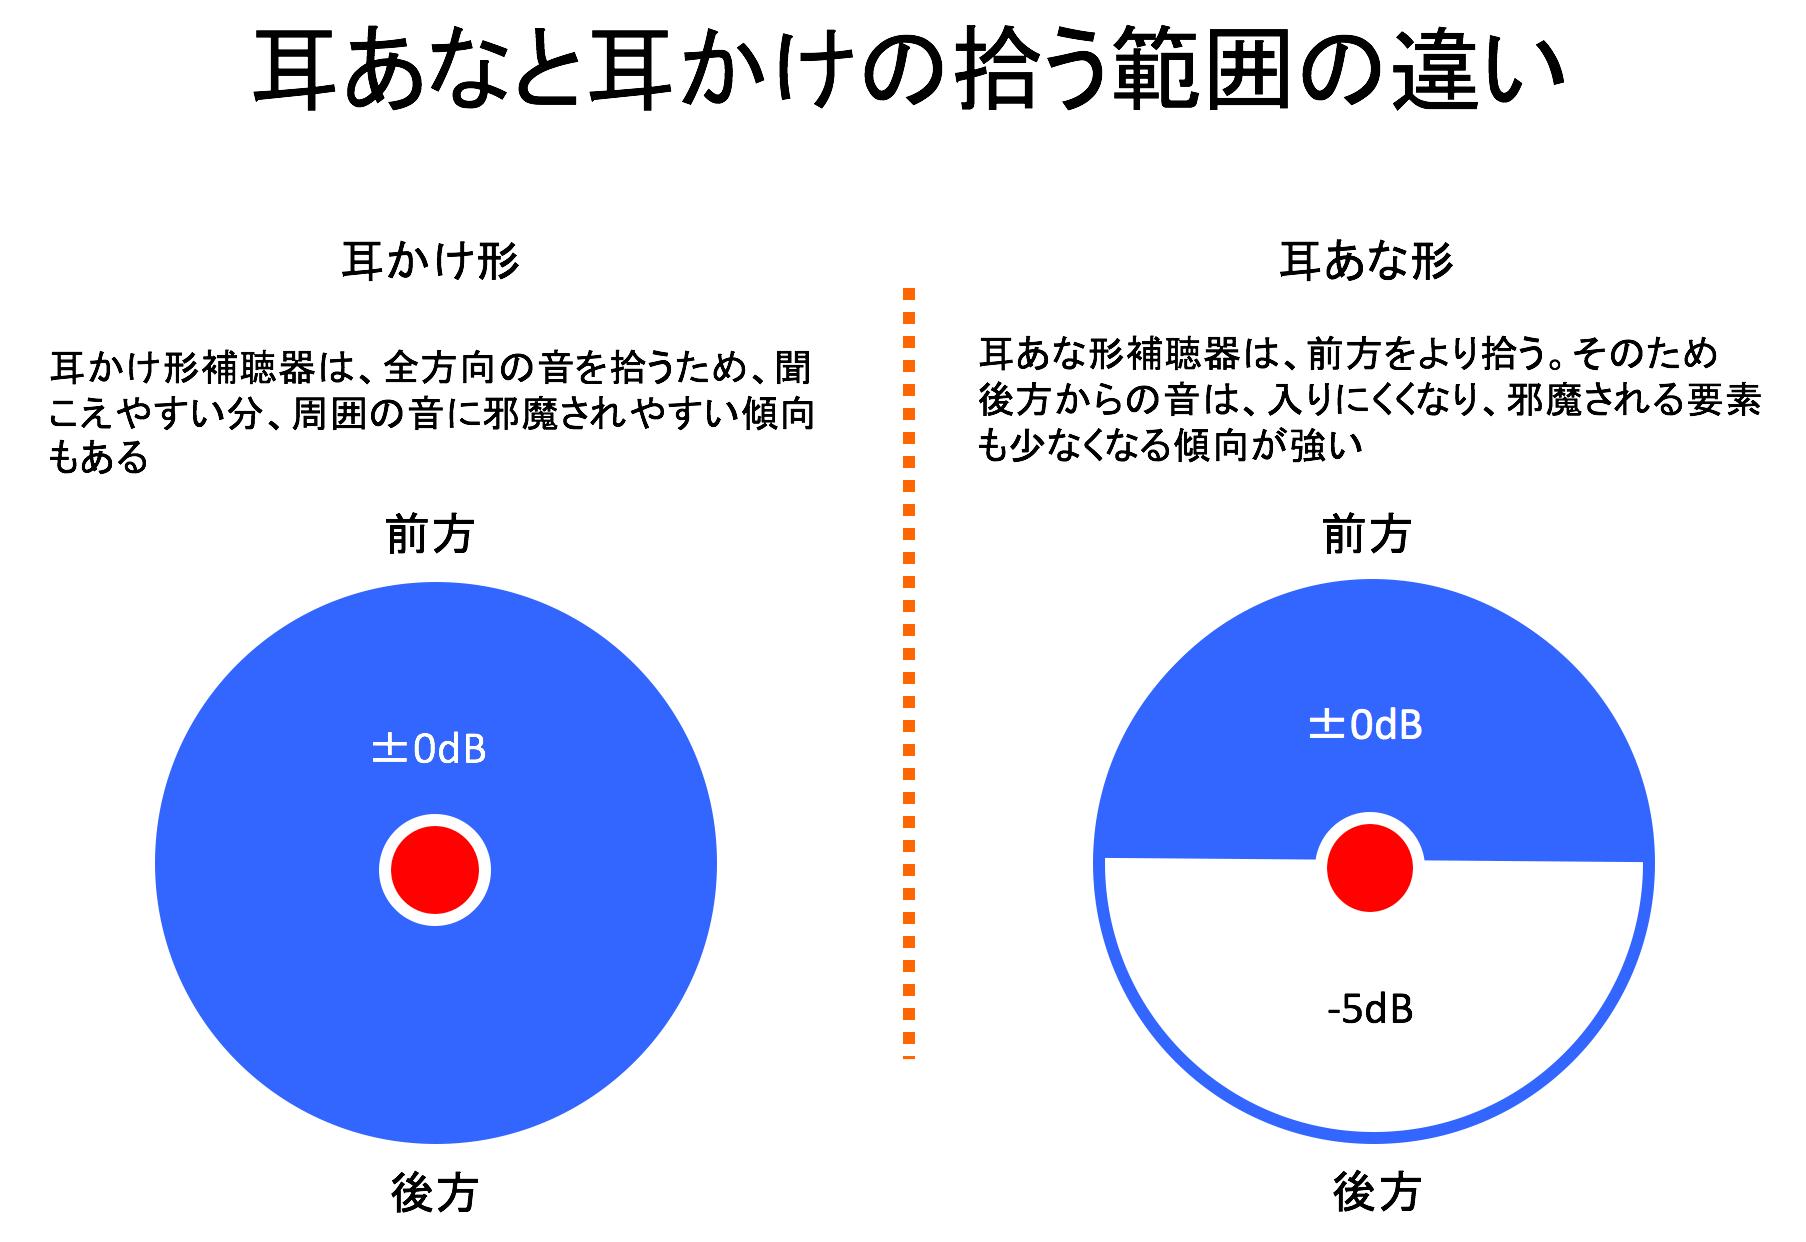 hirou-hani-2